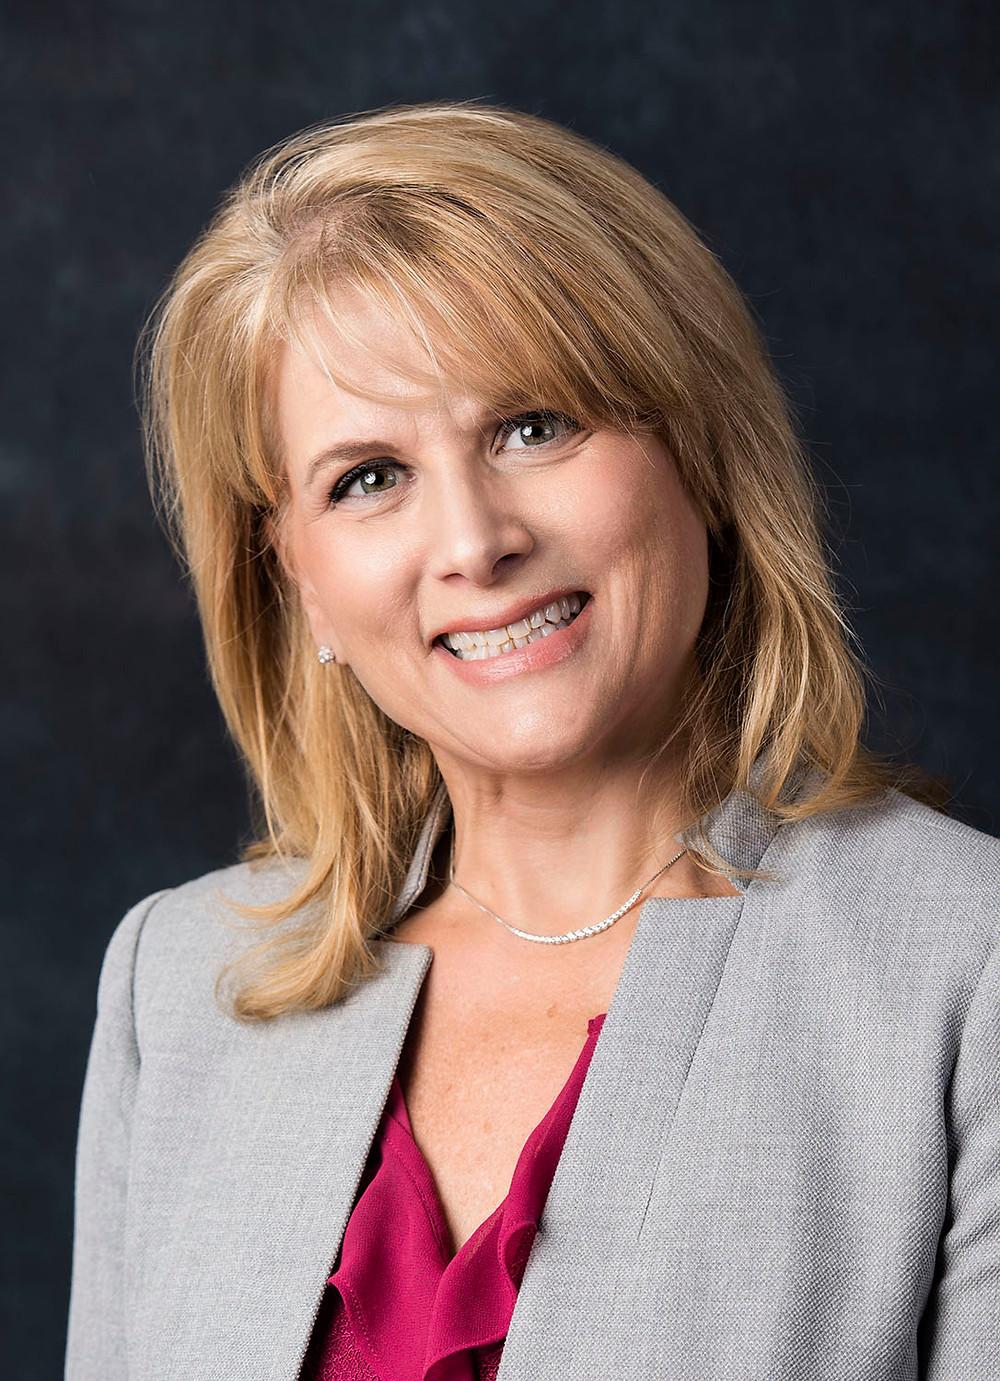 Karen Anderson, President of the Board